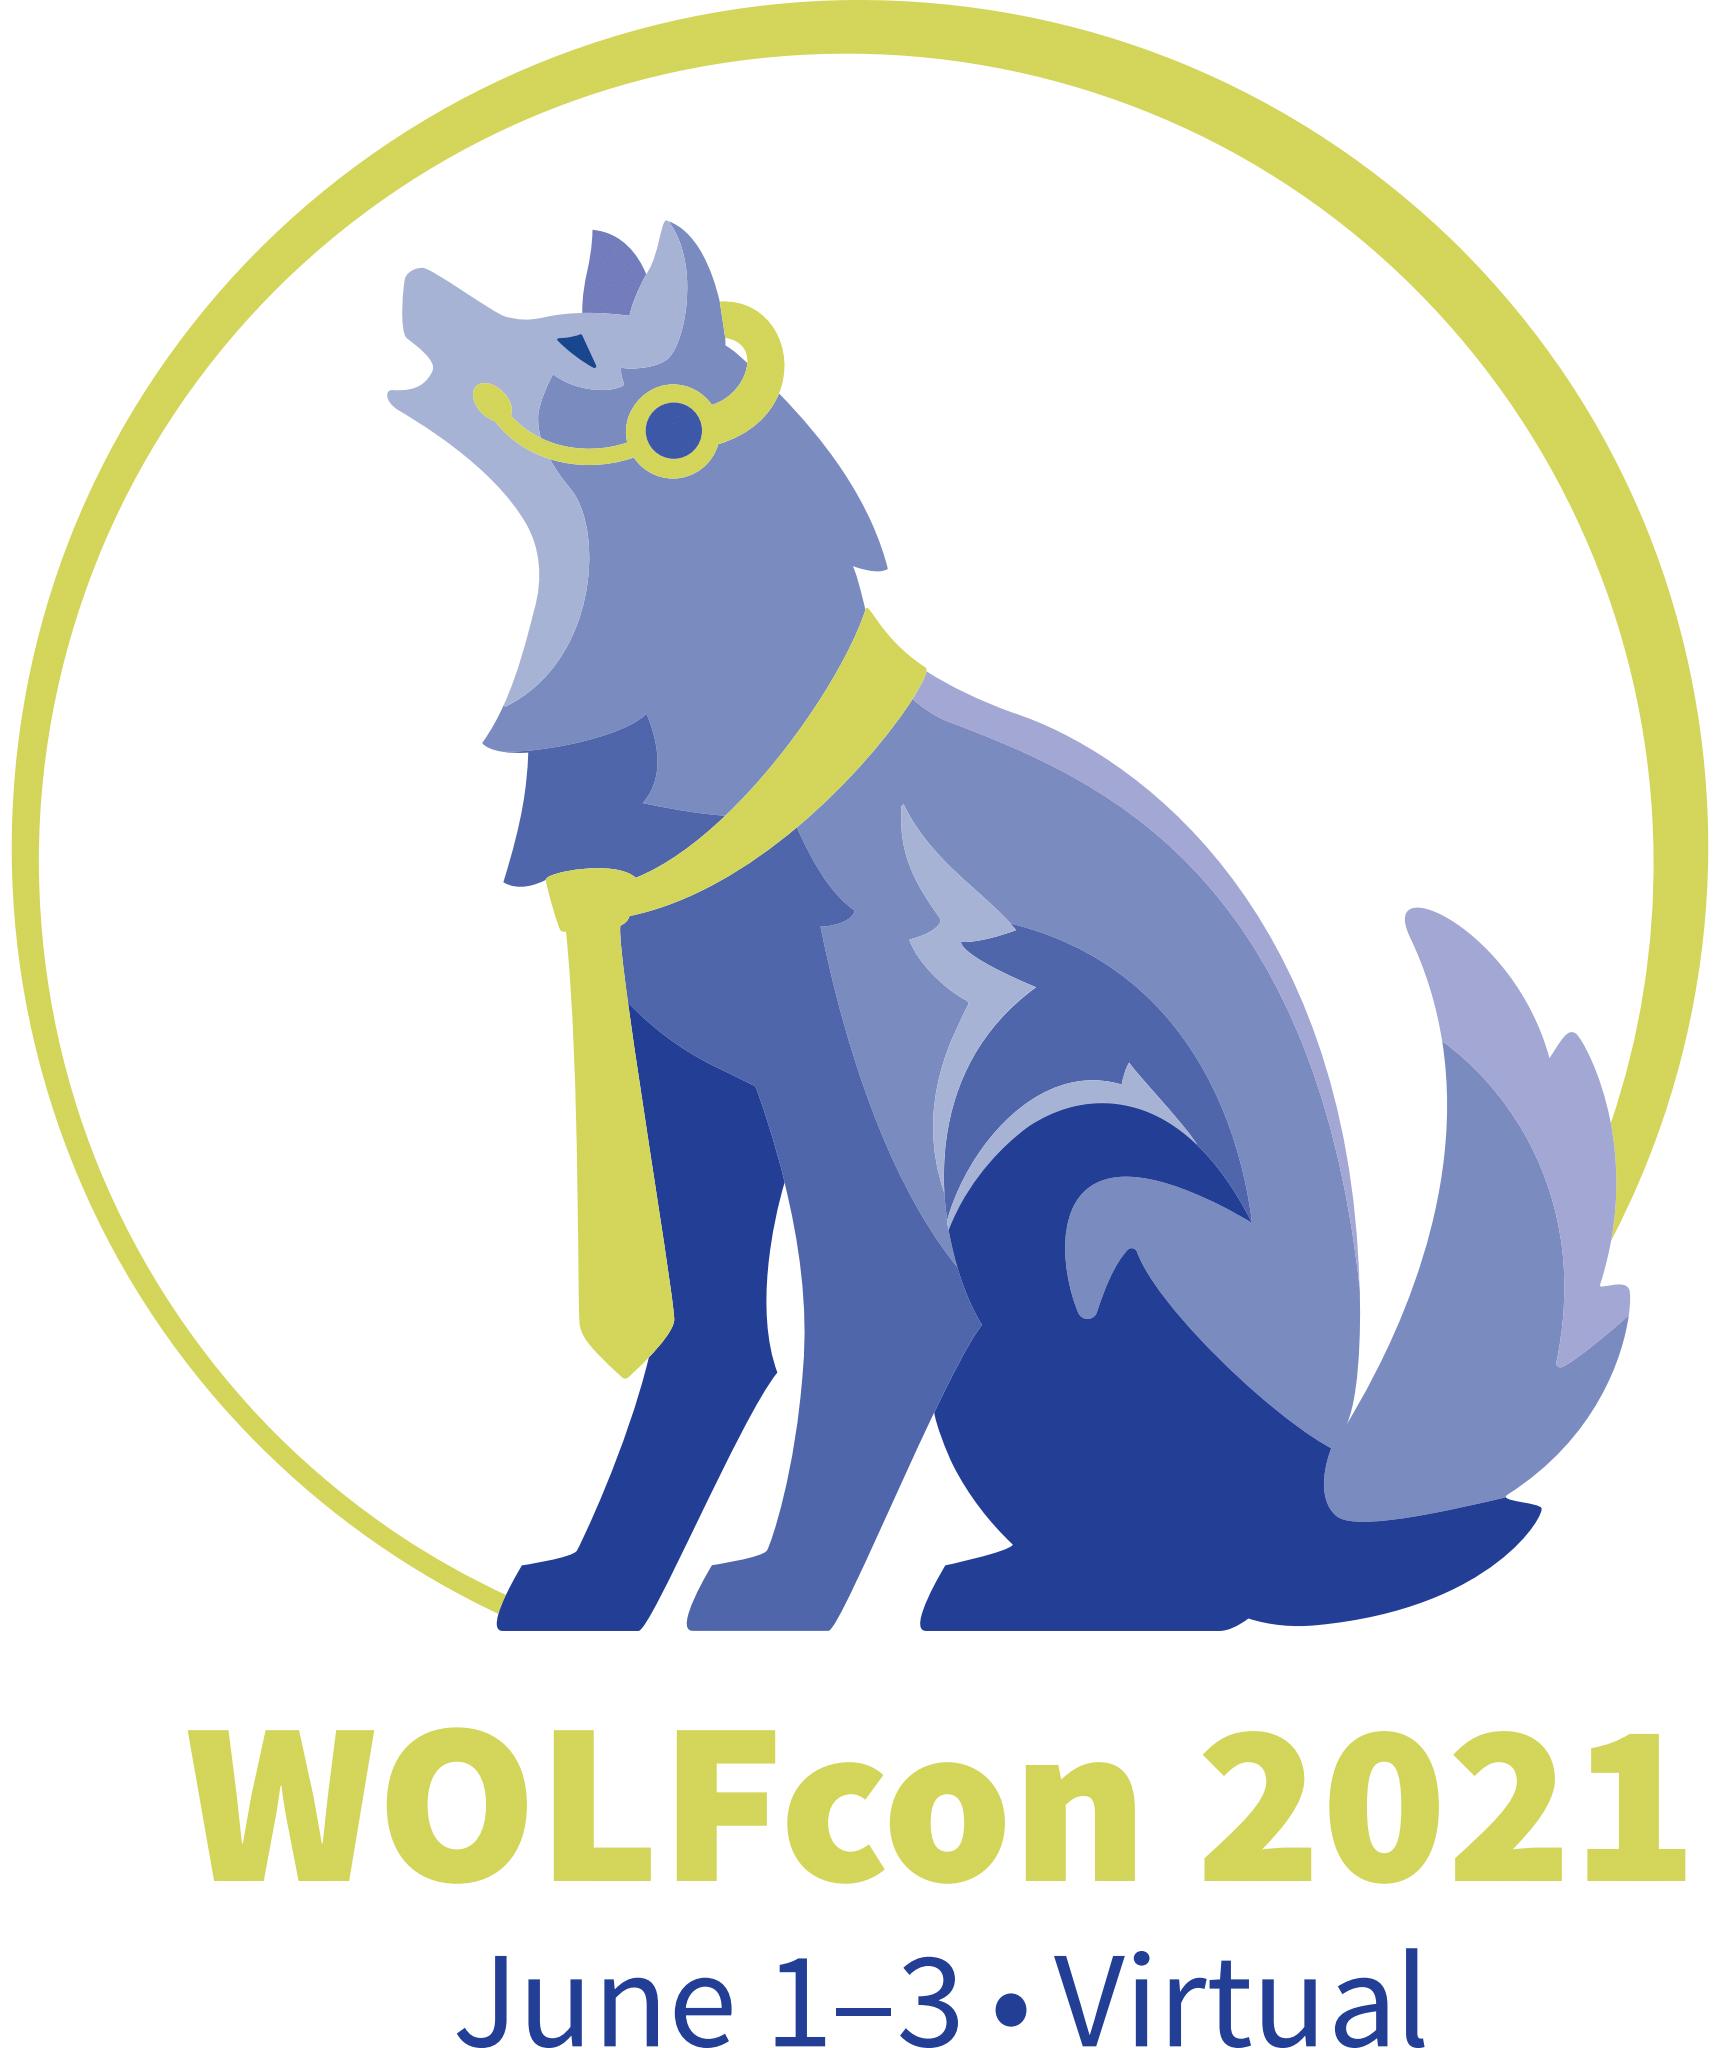 WOLFcon 2021 June 1-3 Virtual